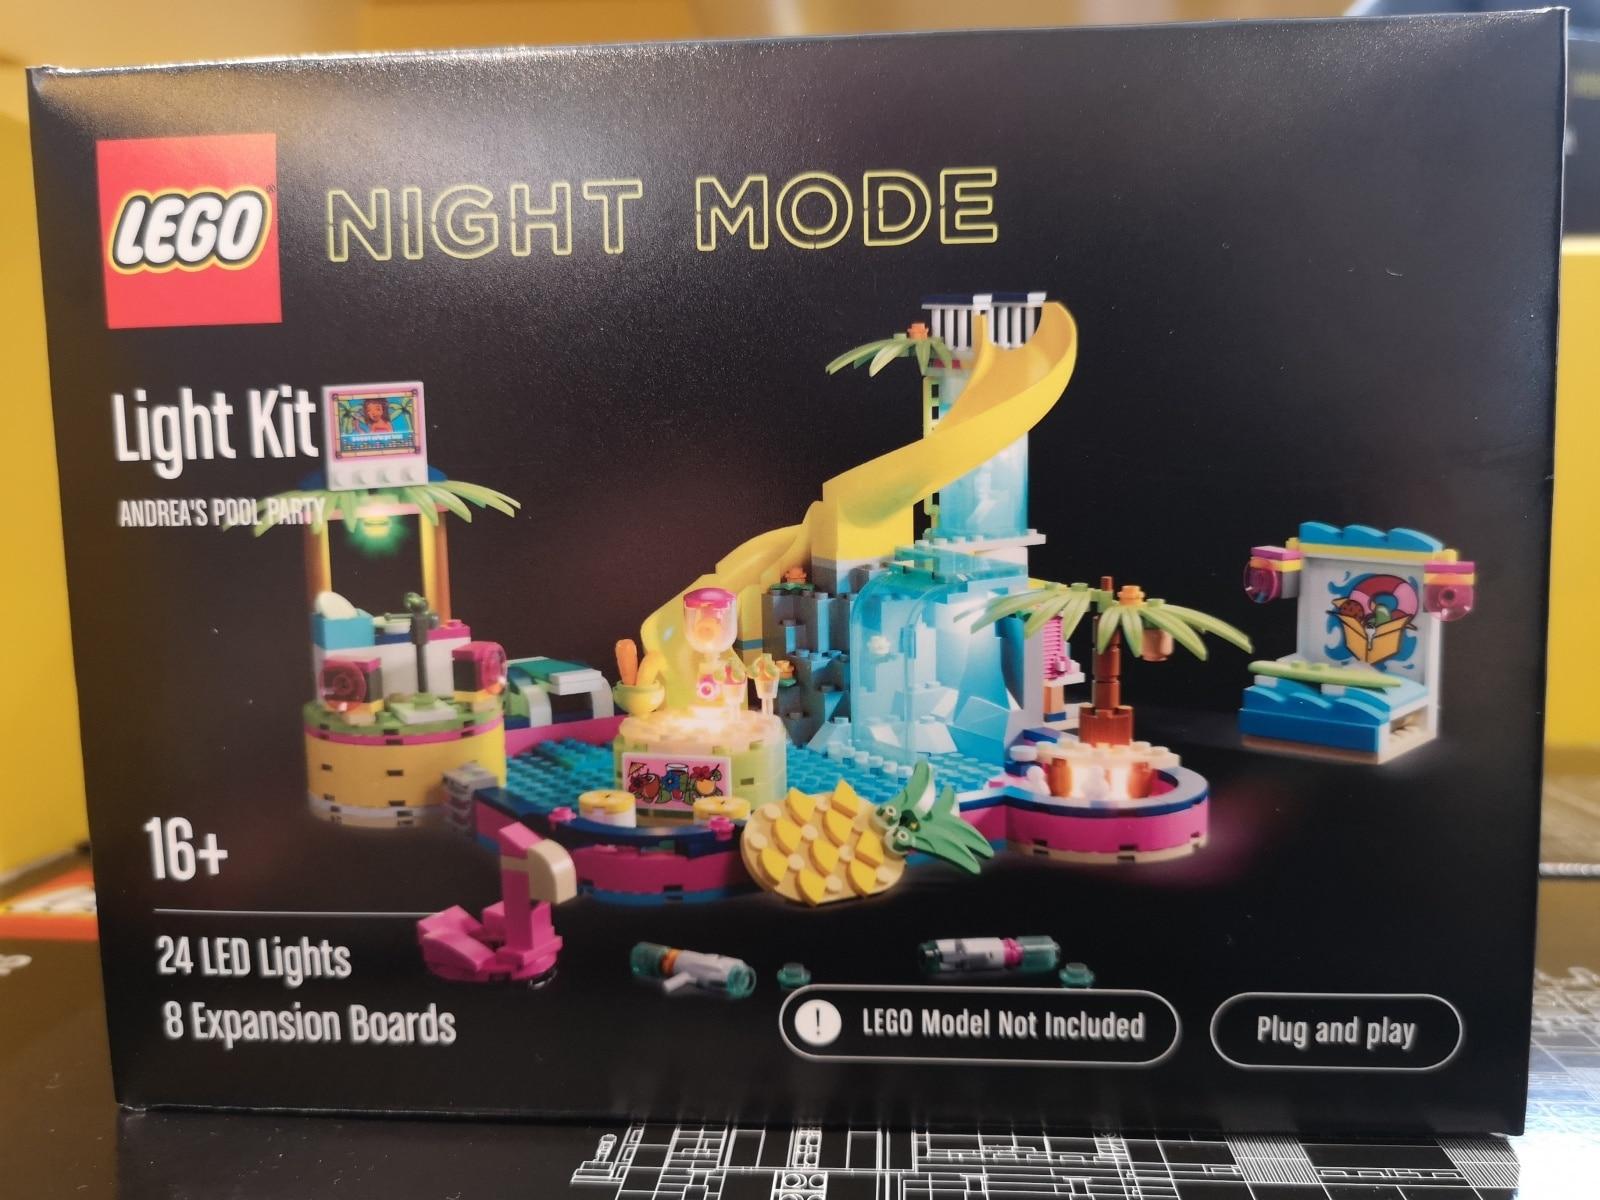 https://www.stonewars.de/wp-content/uploads/2020/02/lego-night-mode-led-sets-5.jpg